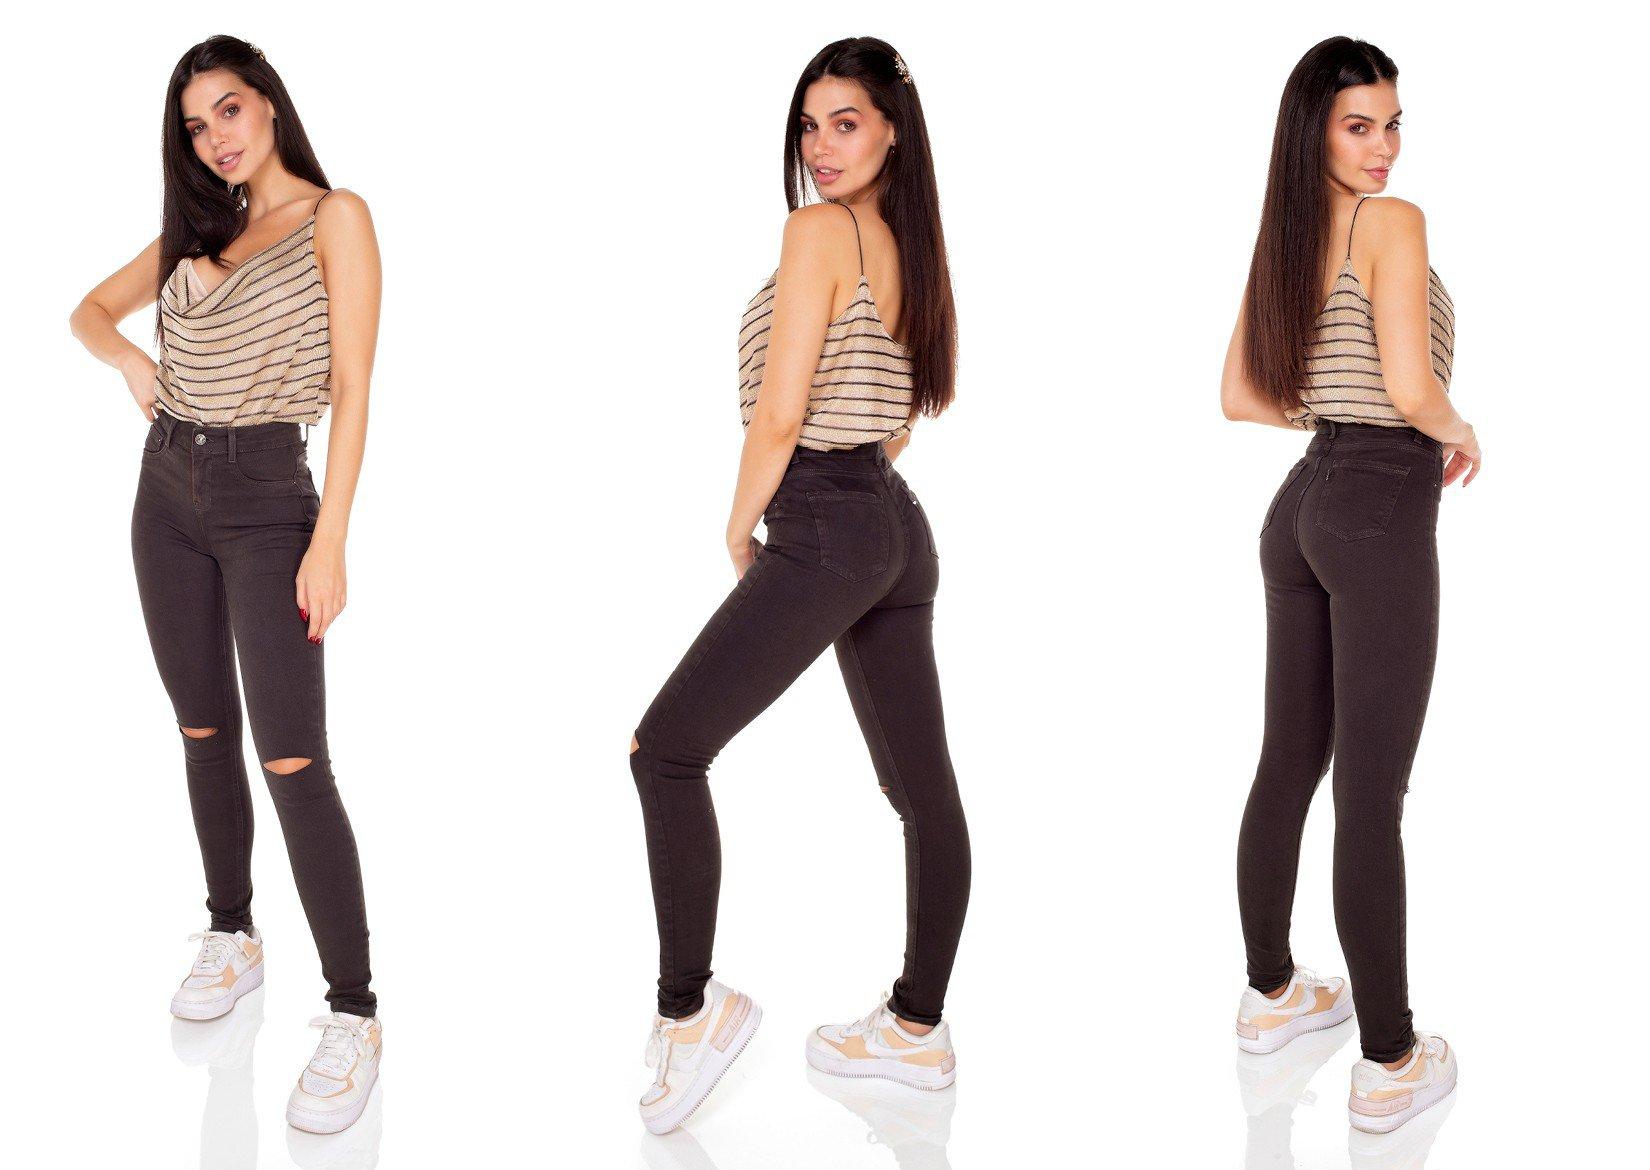 dz3418 calca jeans feminina skinny media colorida verde escuro denim zero tripla